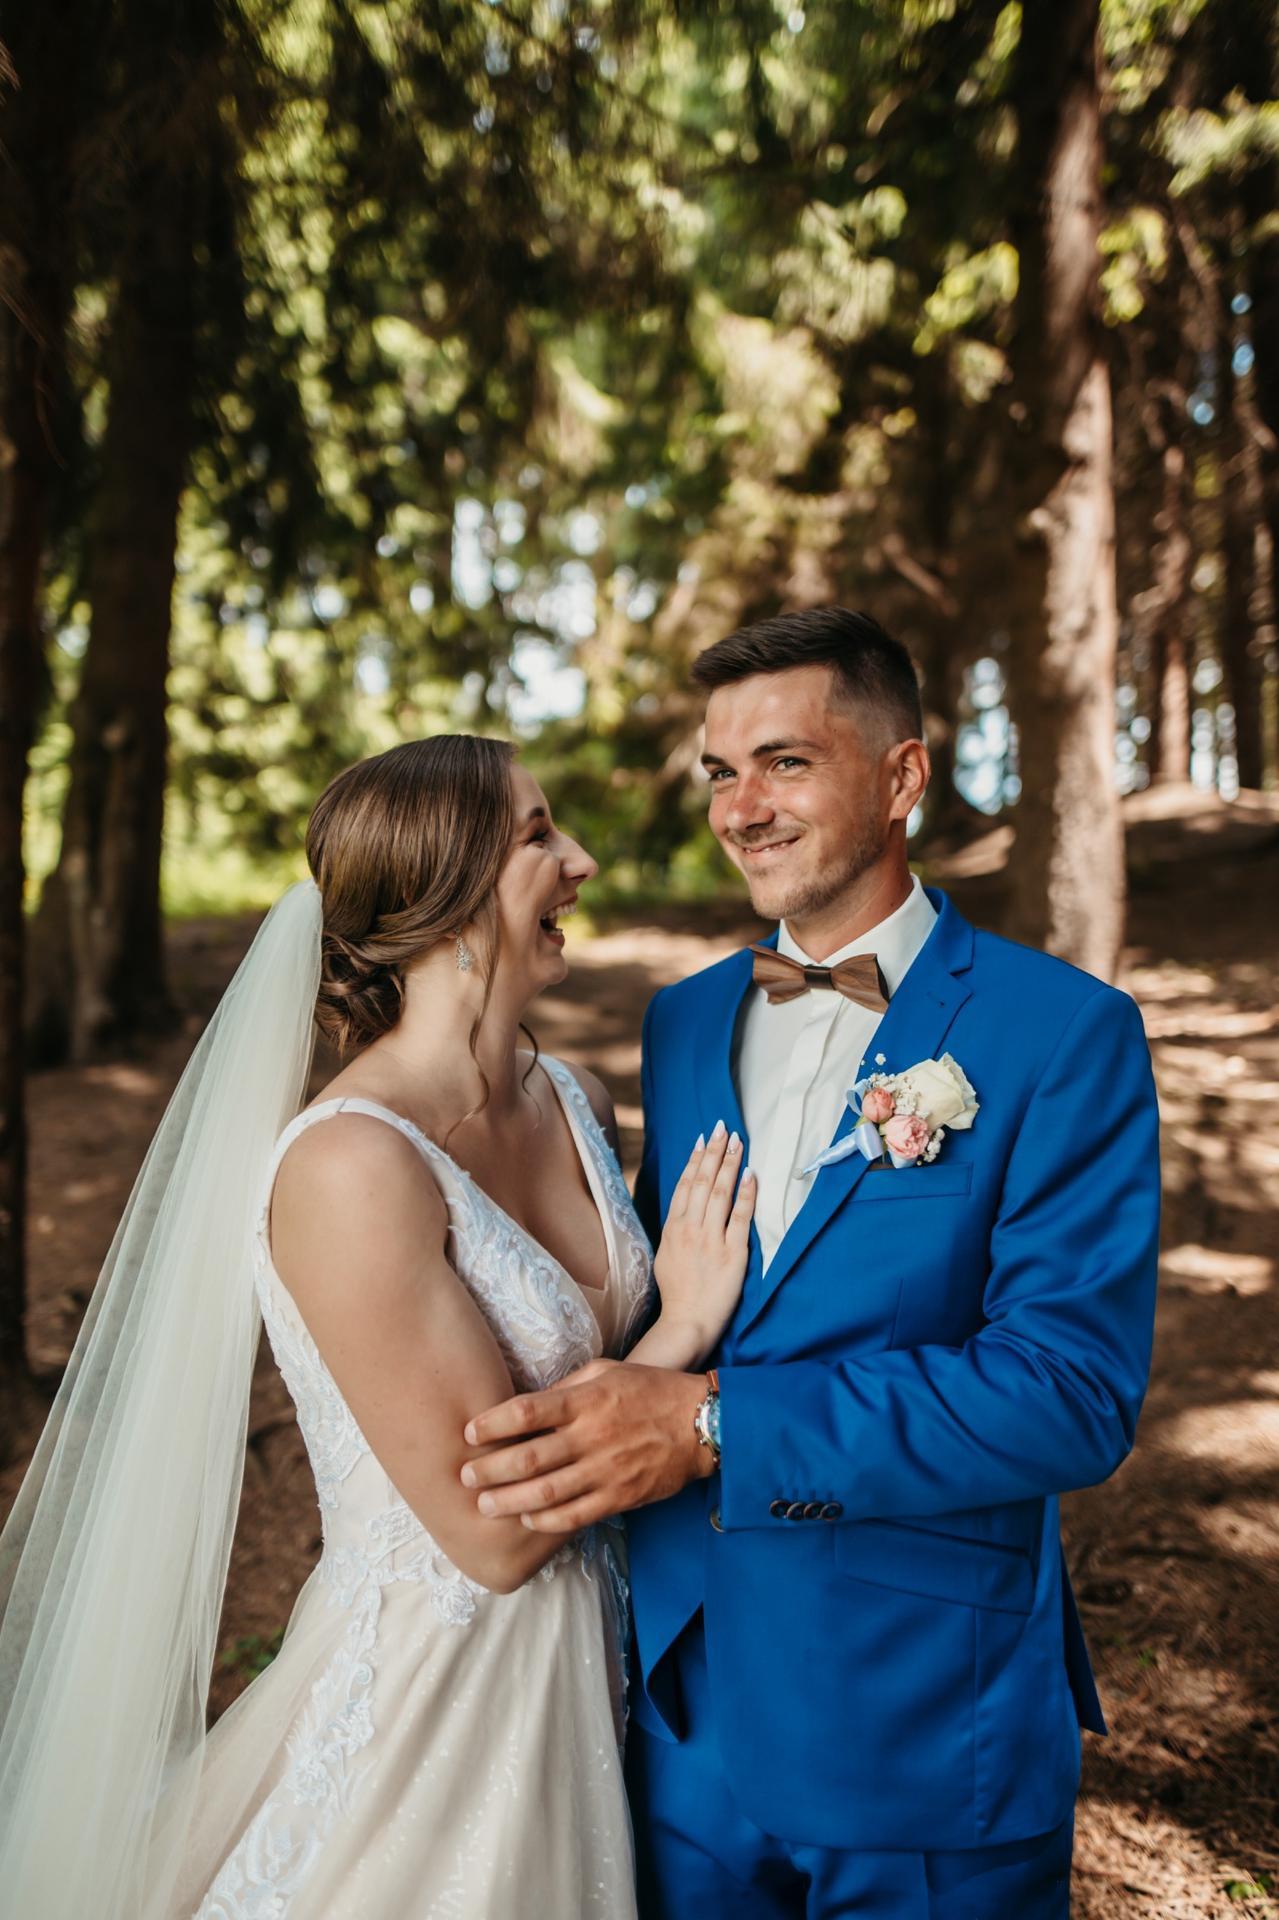 Our wedding ❤️ - Obrázok č. 3